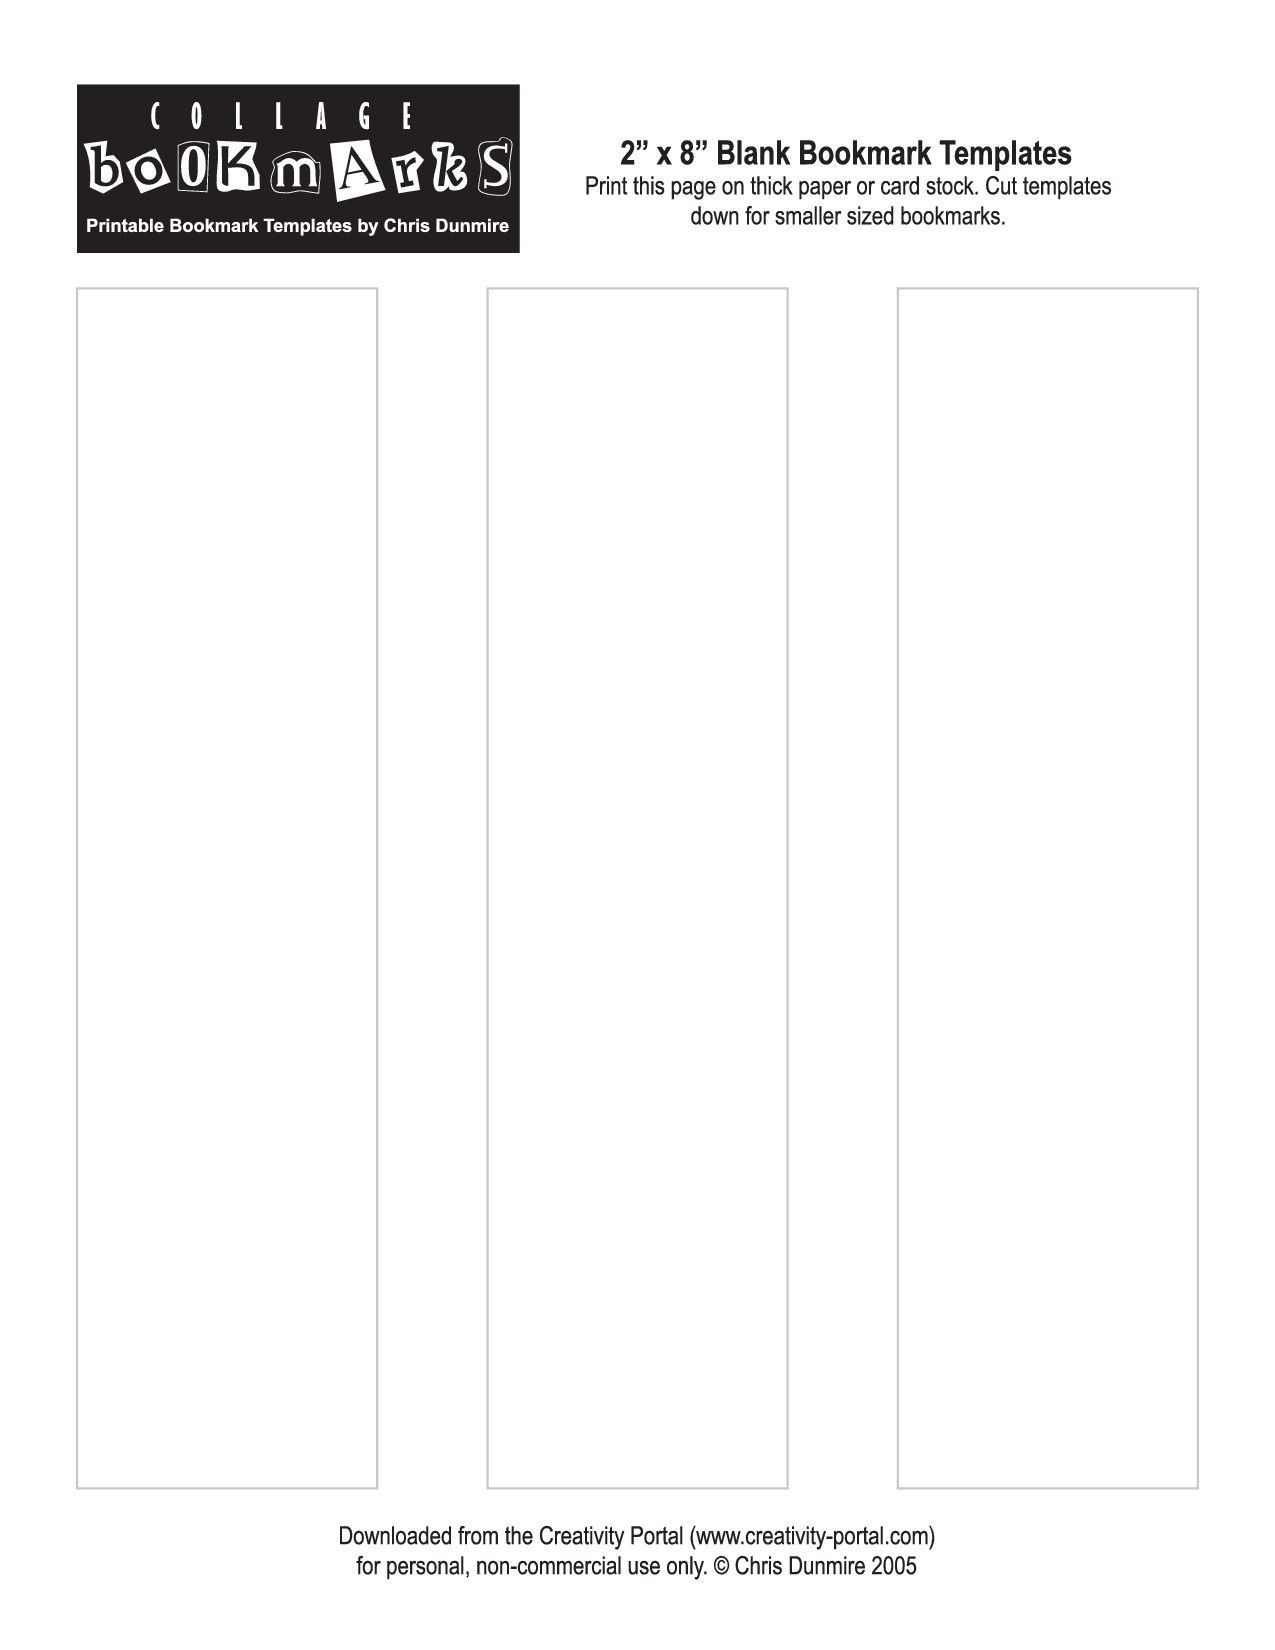 Blank Bookmark Template Printable | Printables!@!@!@ | Bookmark - Free Printable Blank Bookmarks